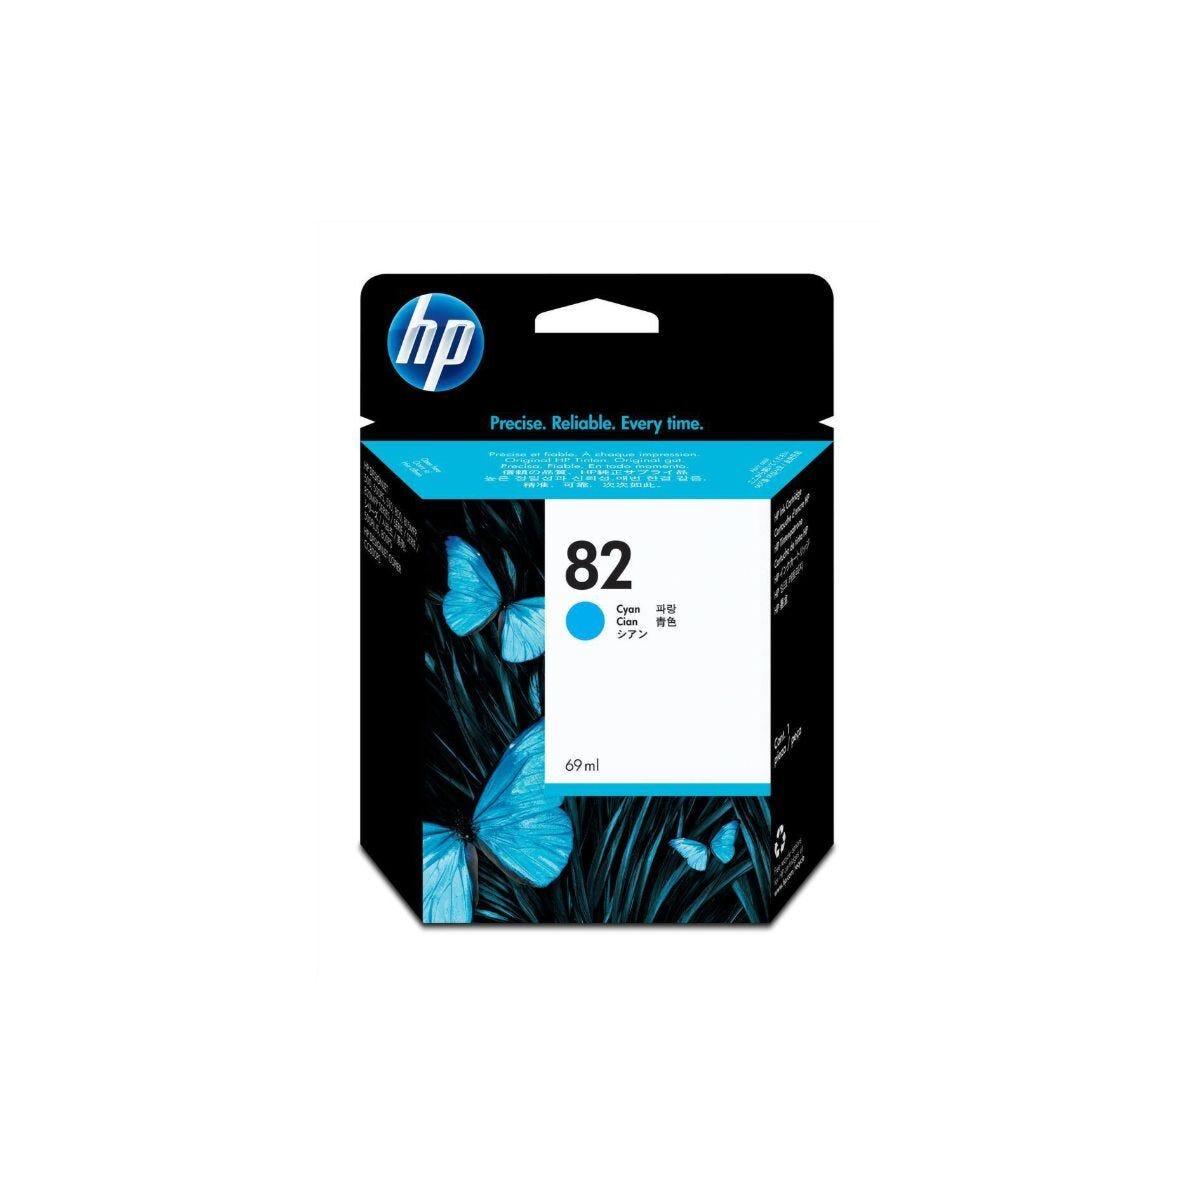 HP 82 Dye Inkjet Cartridge Cyan